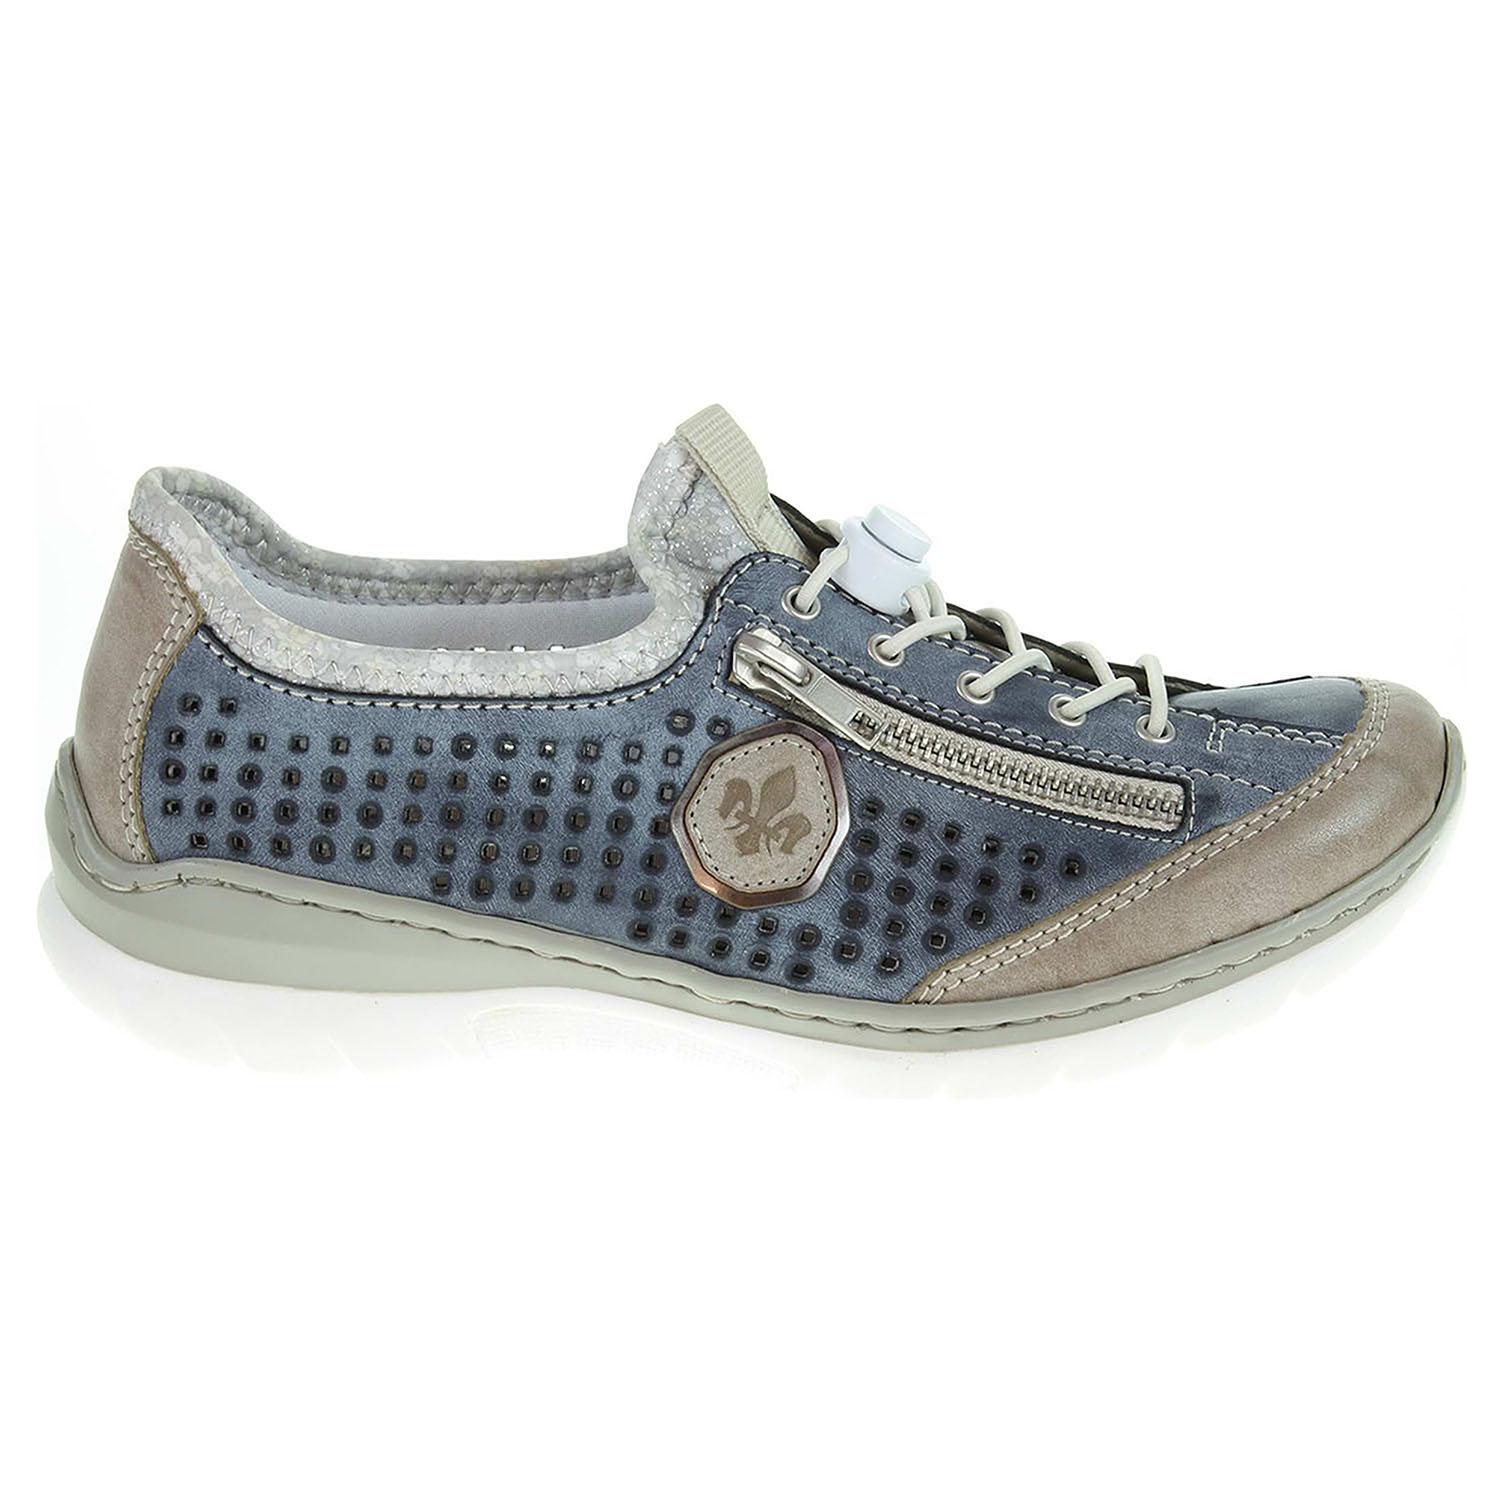 Ecco Rieker dámská obuv L3296-42 blau kombi 23100622 36f1cd70640